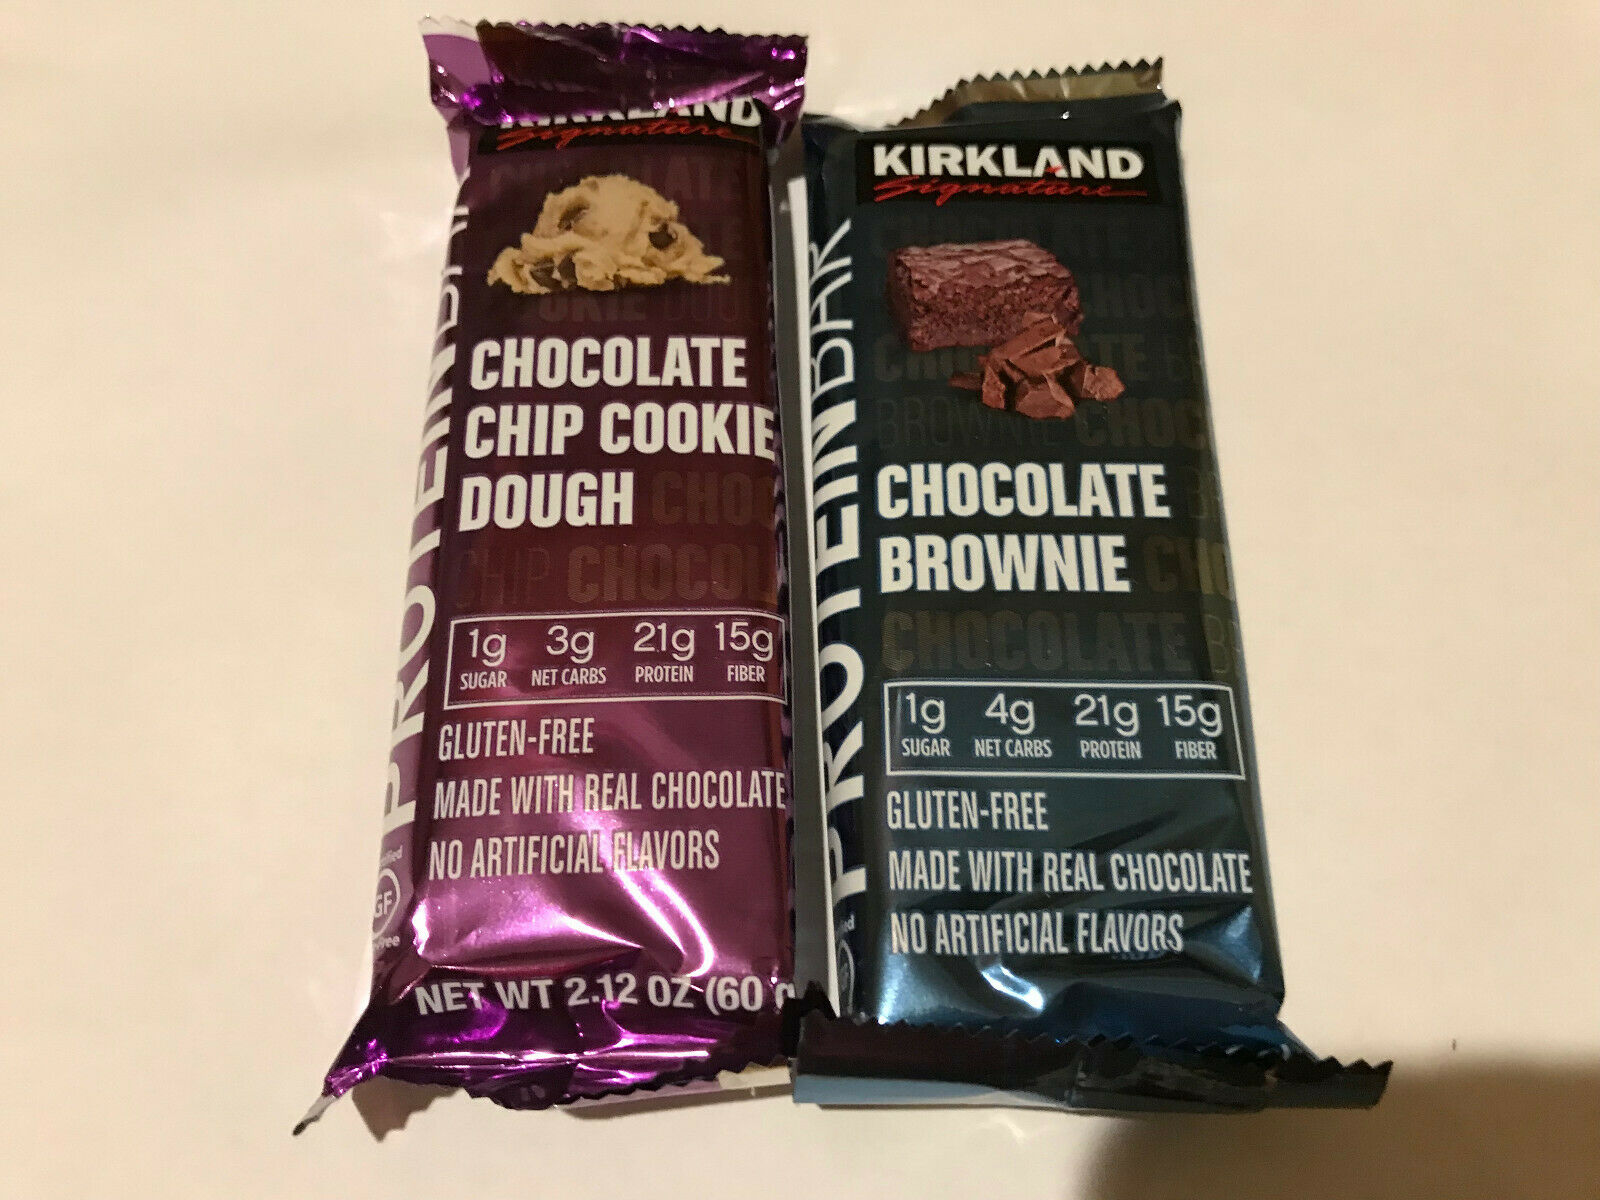 190kcal 21g protein bars 2 12 oz